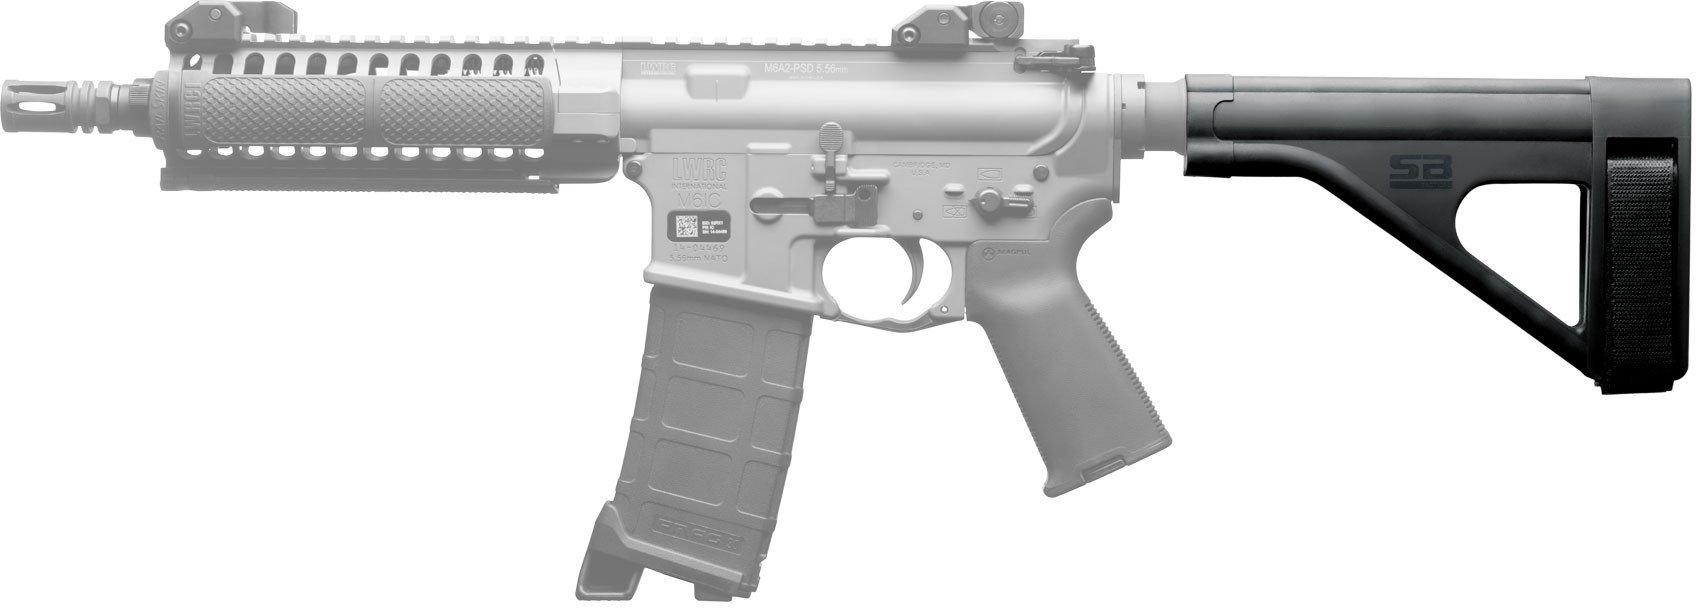 SB Tactical SOB Pistol Stabilizing Brace (Options)